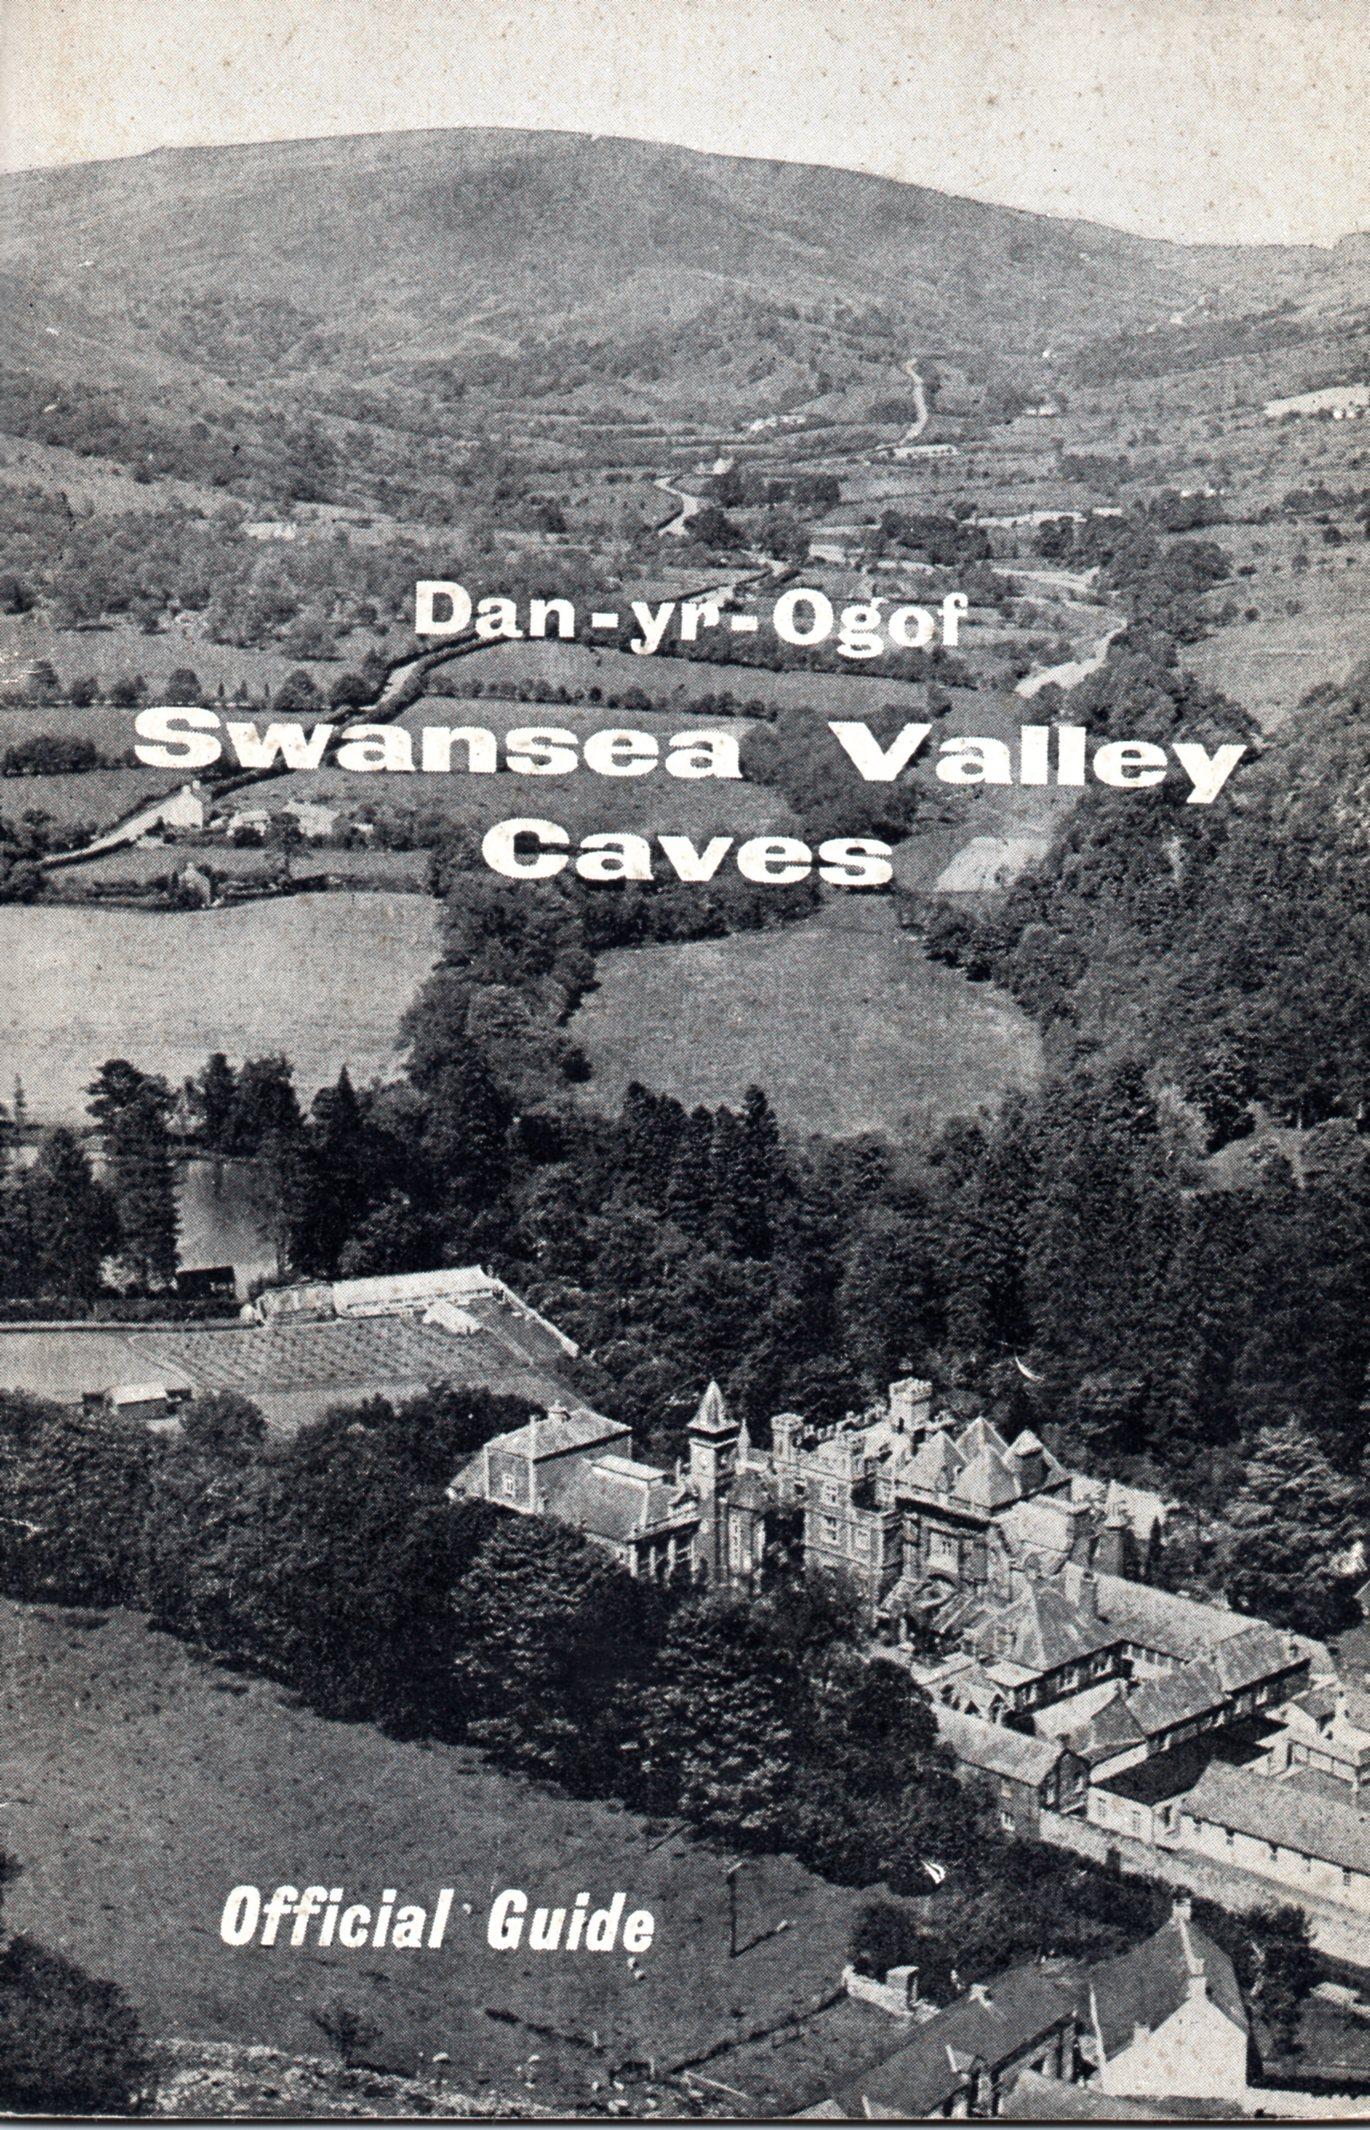 [USED]Dan-yr-Ogof Swansea Valley Caves Official Guide